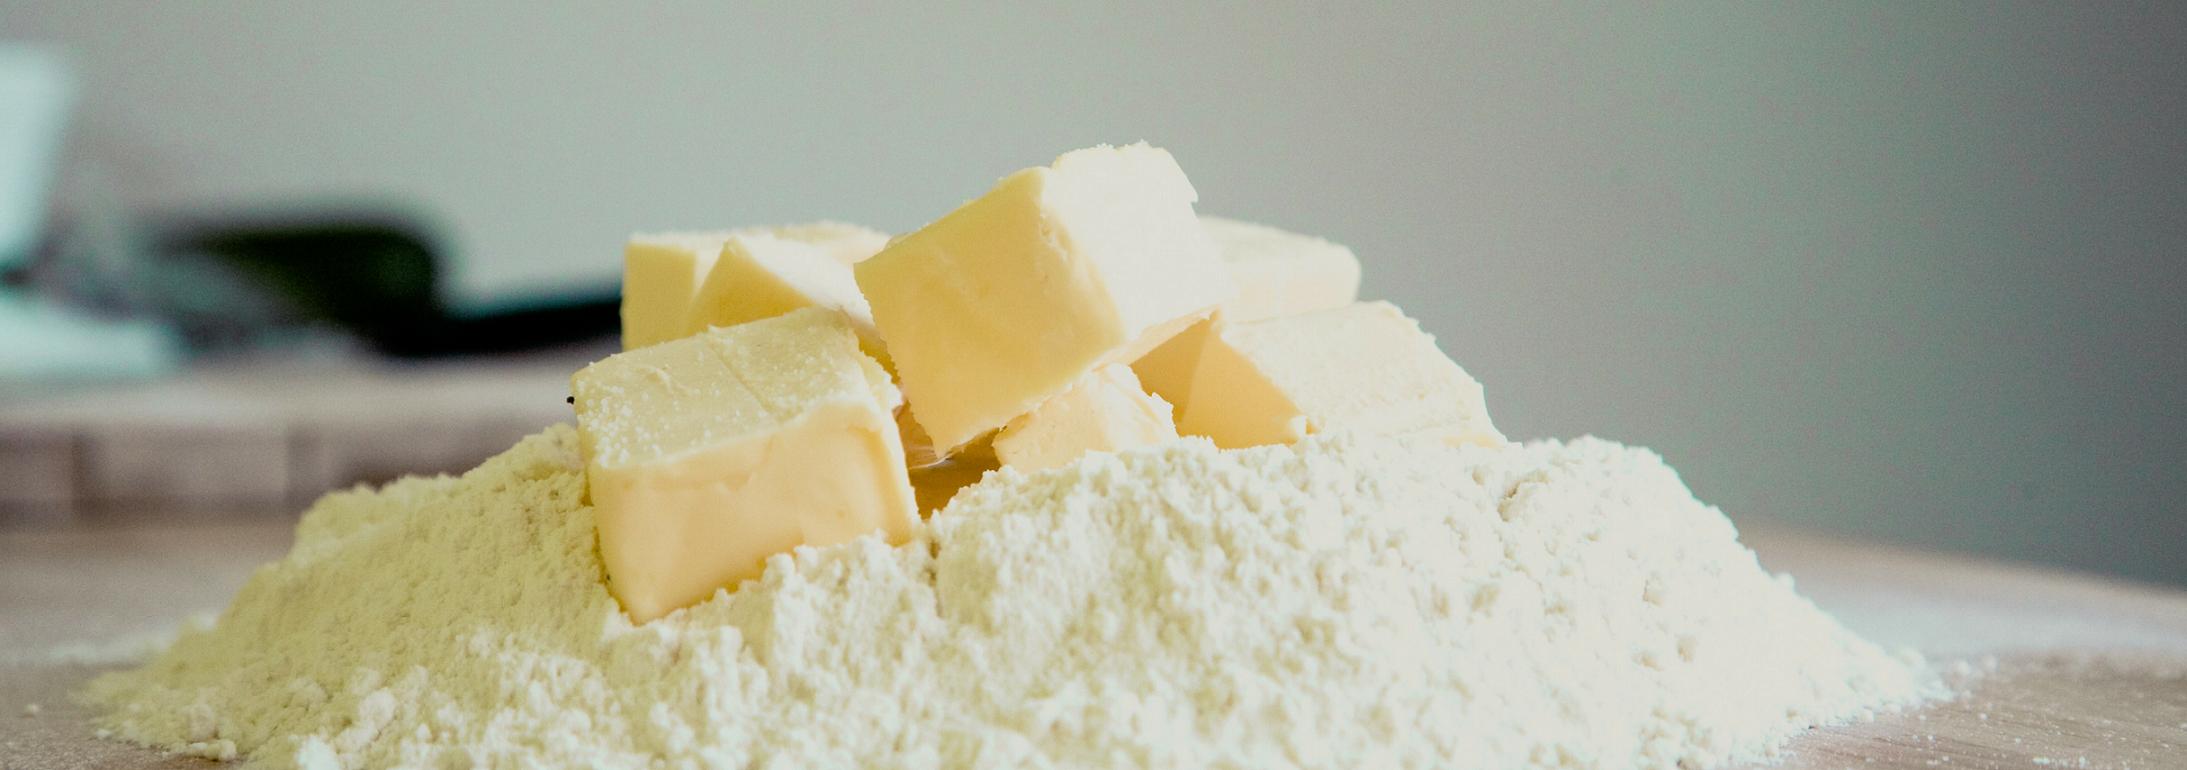 Flour Butter Pancake Recipe Ingredients Heart of the Village Inn